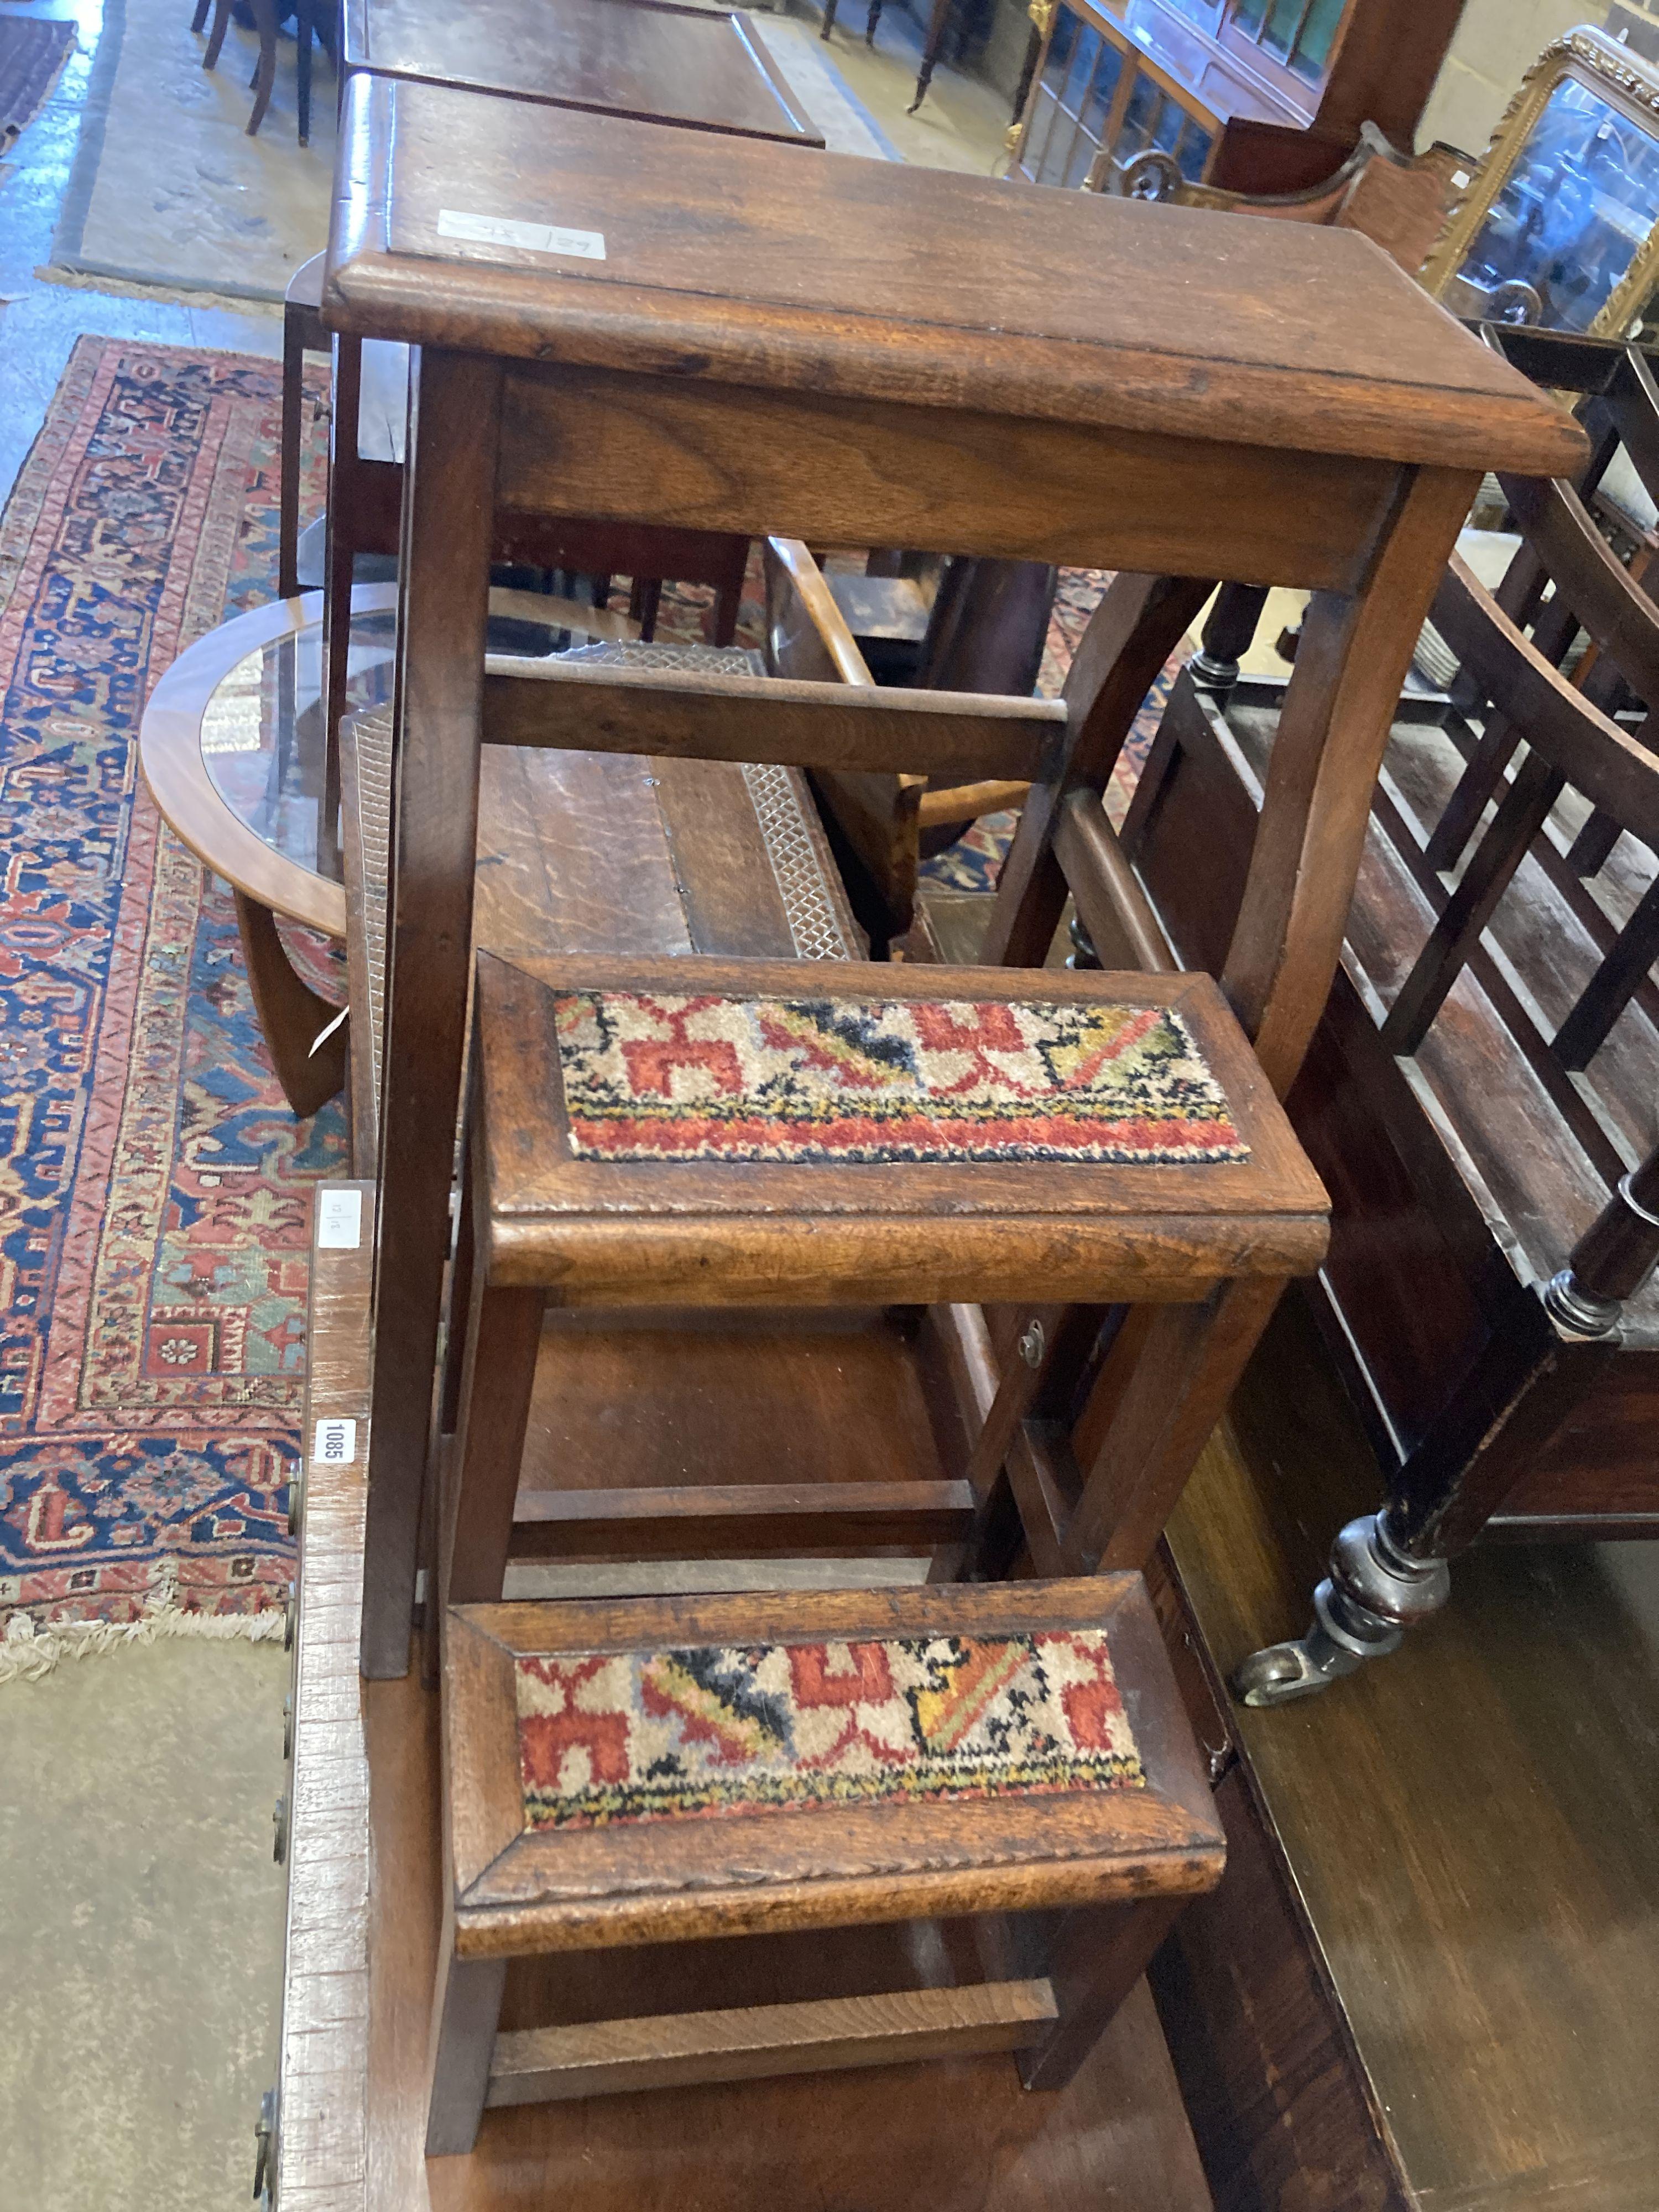 A mahogany metamorphic step/stool, width 42cm, depth 28cm, height 72cm - Image 2 of 4